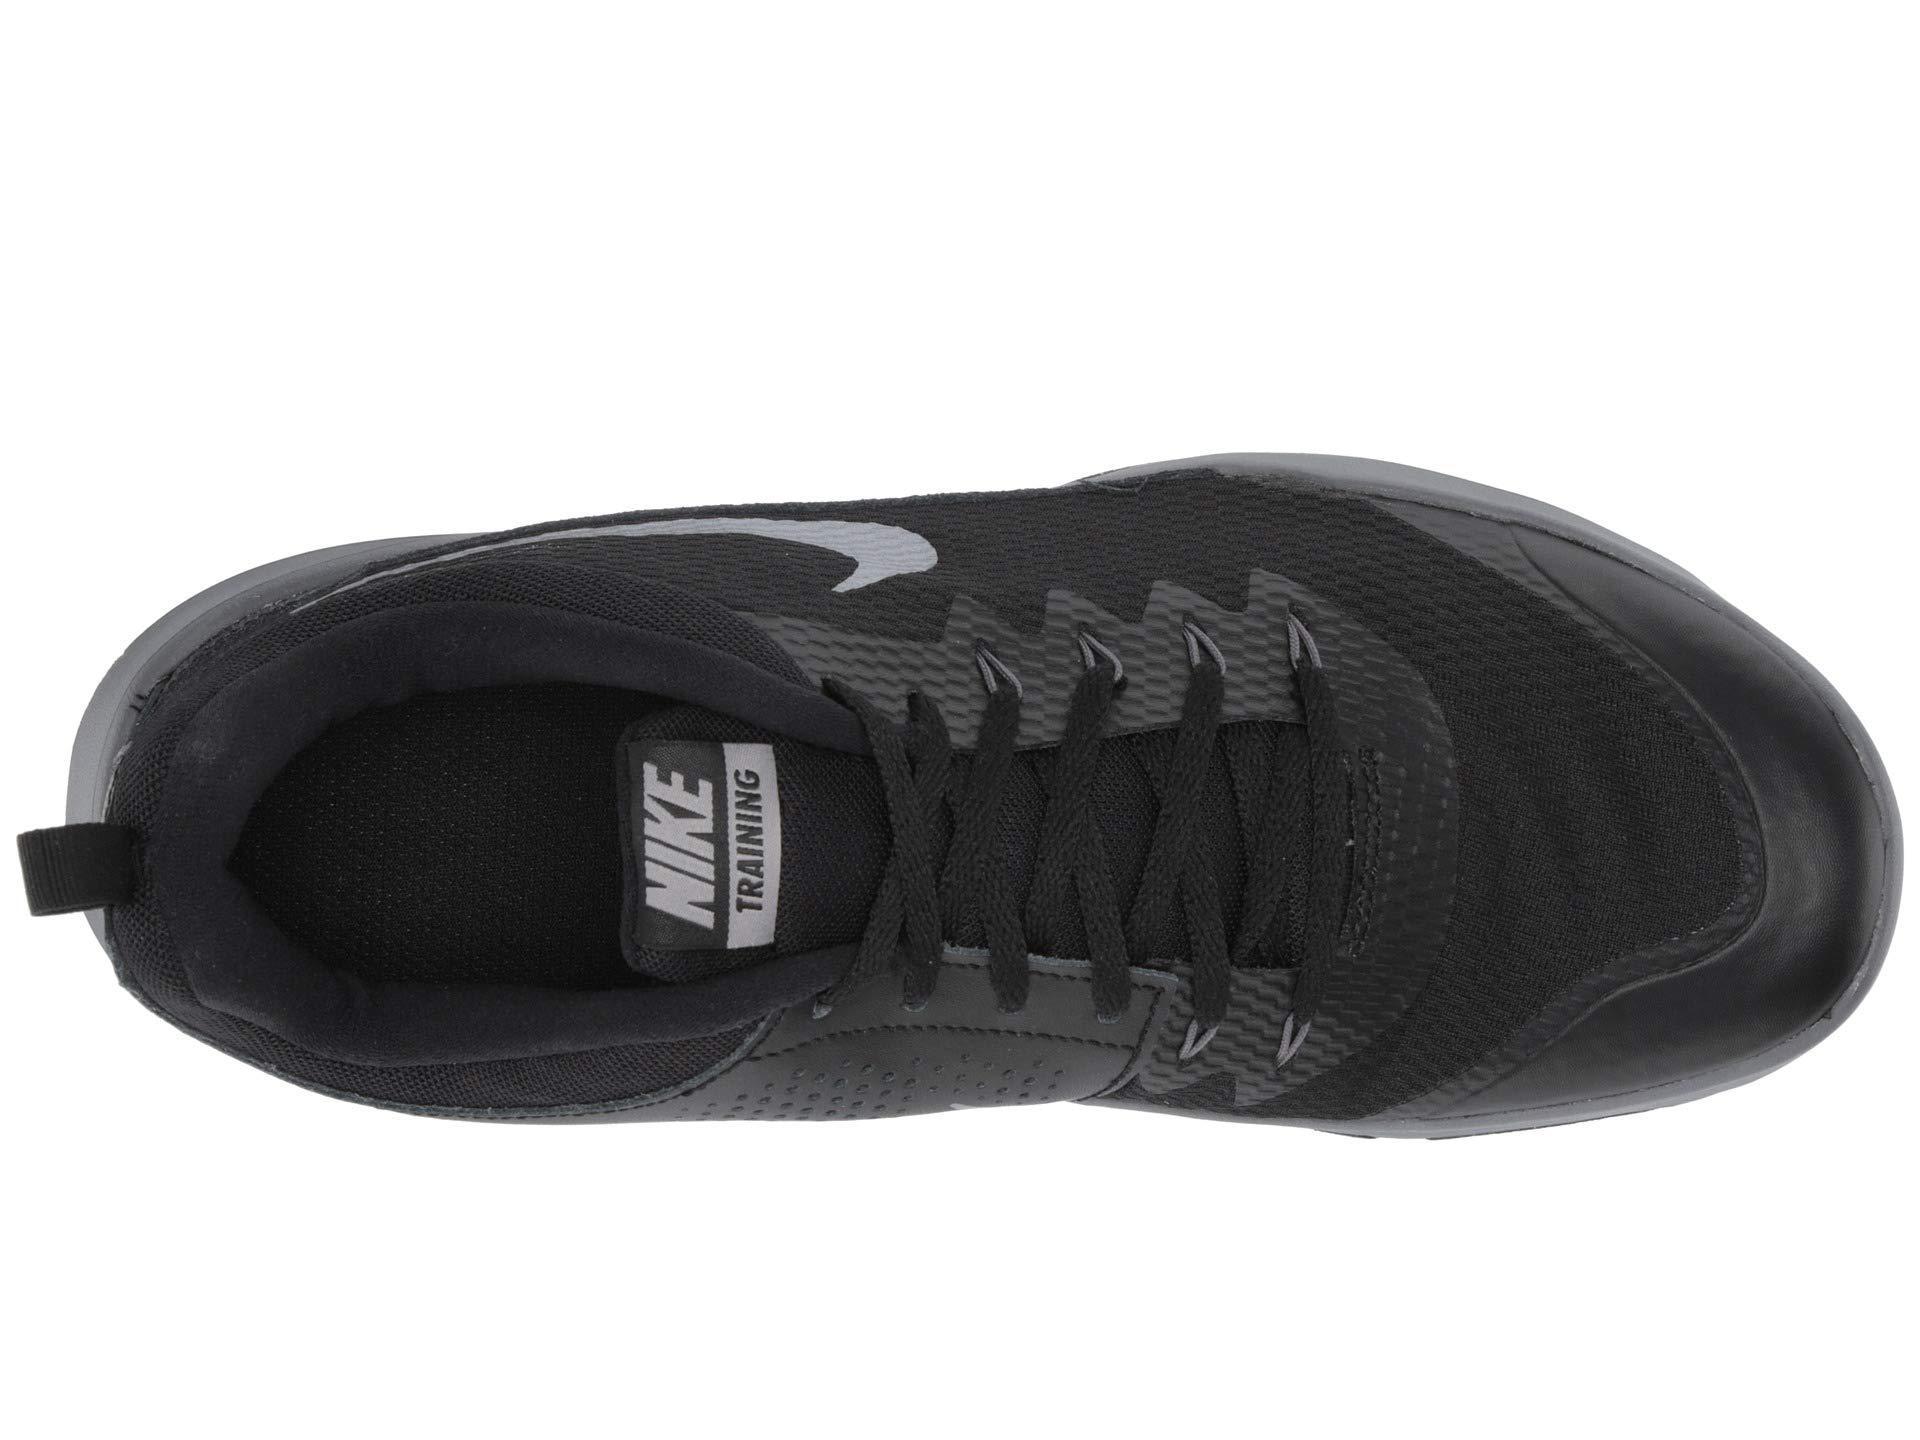 reputable site 52306 7d78e Lyst - Nike Legend Trainer (black metallic Silver white) Men s Cross ...